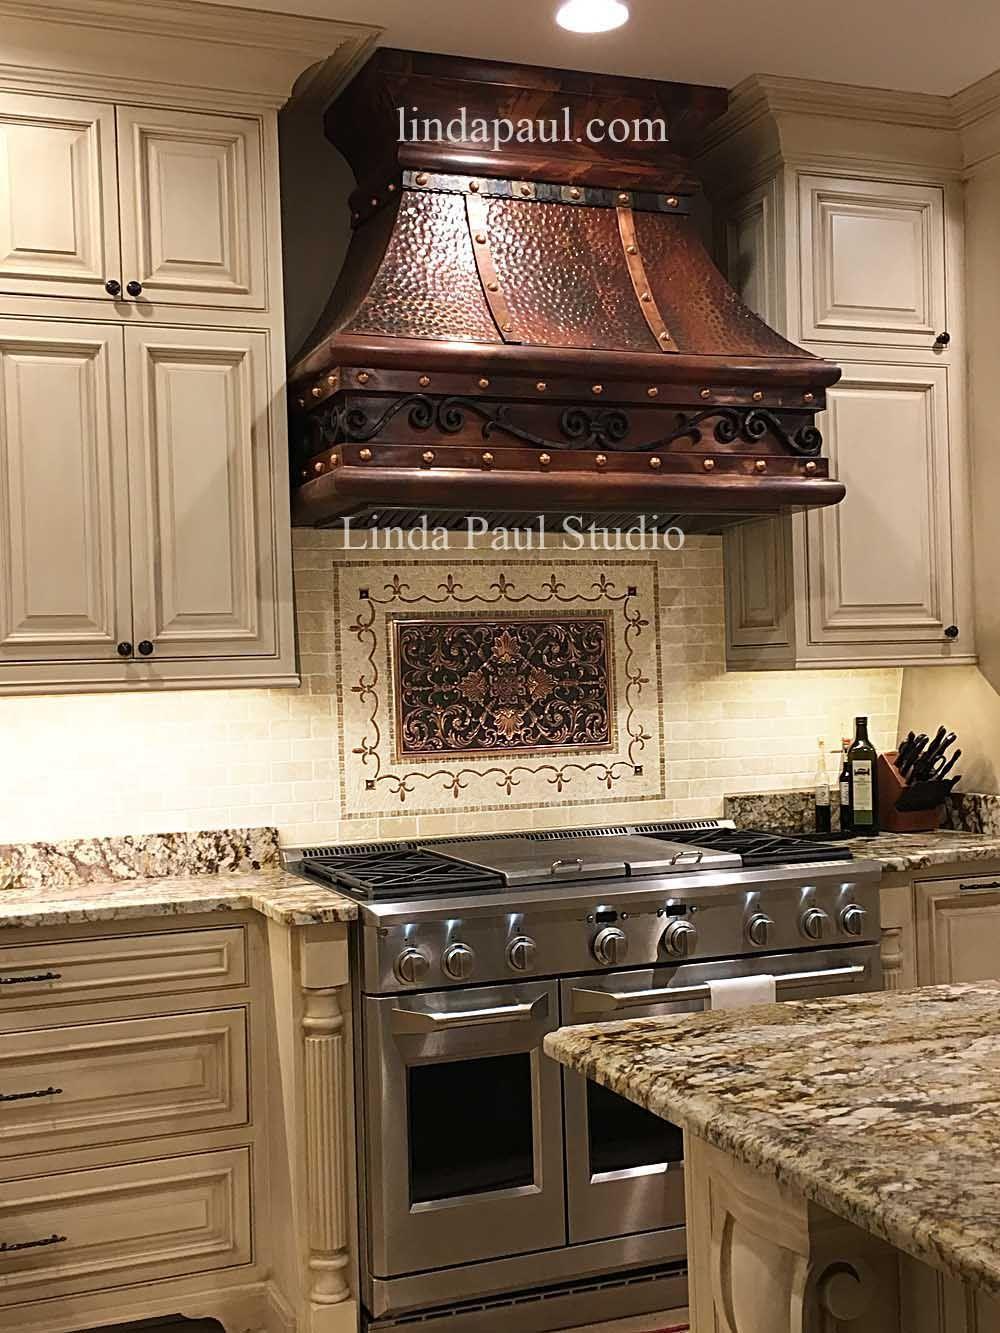 ravenna kitchen backsplash plaque medallion and mosaic in 2020 stove backsplash backsplash on outdoor kitchen backsplash id=23047